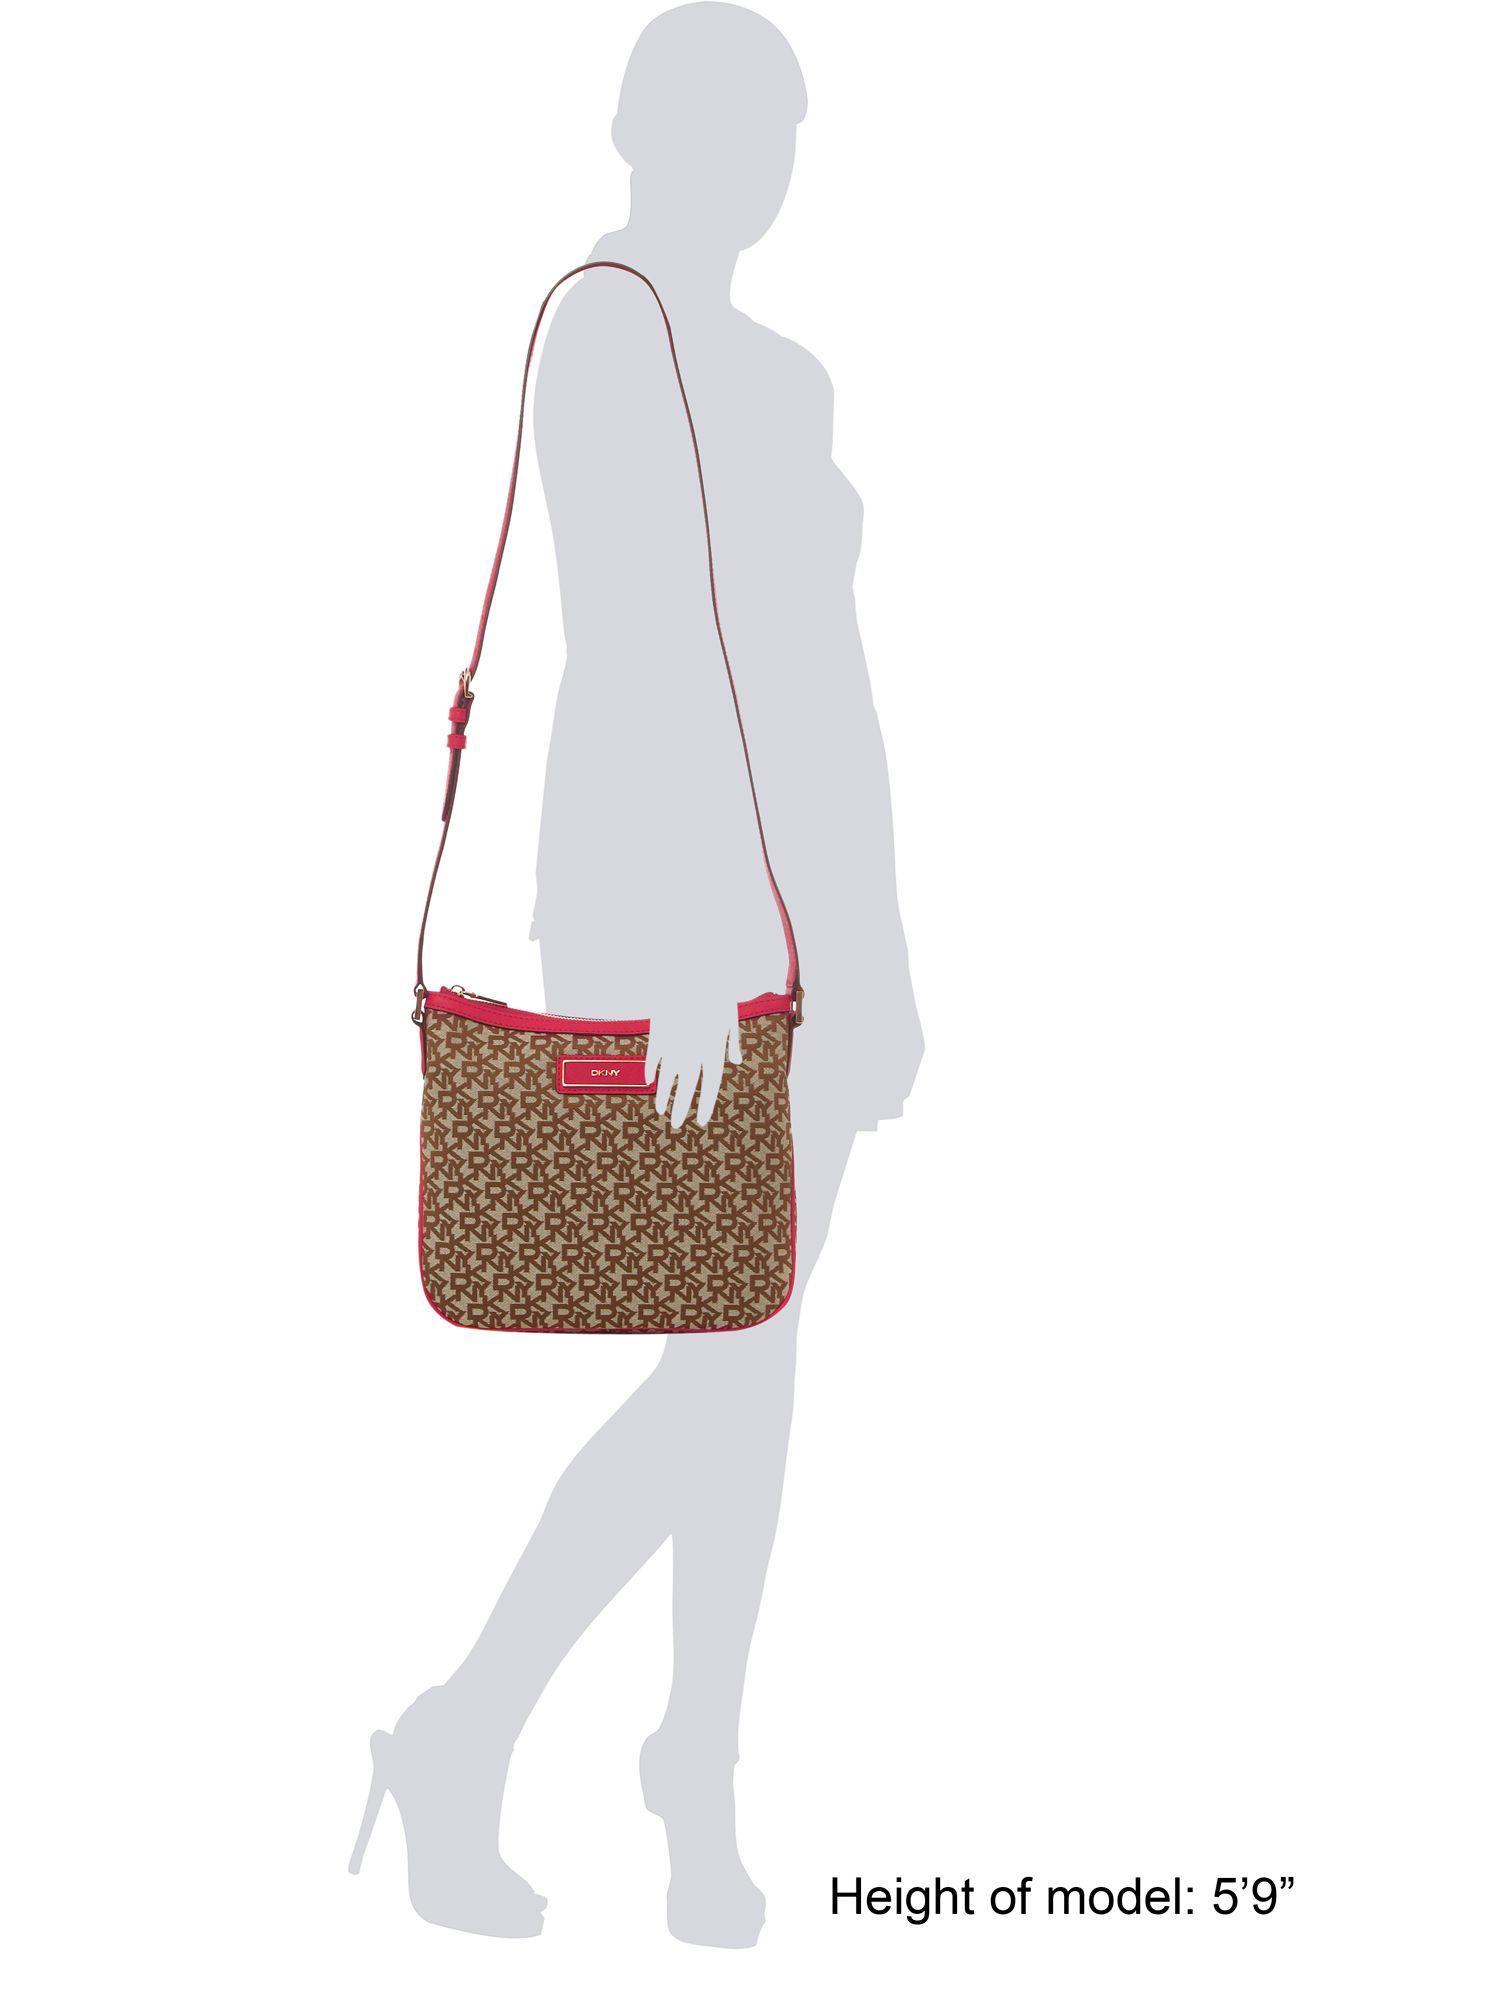 DKNY Saffiano Crossbody Bag in Pink